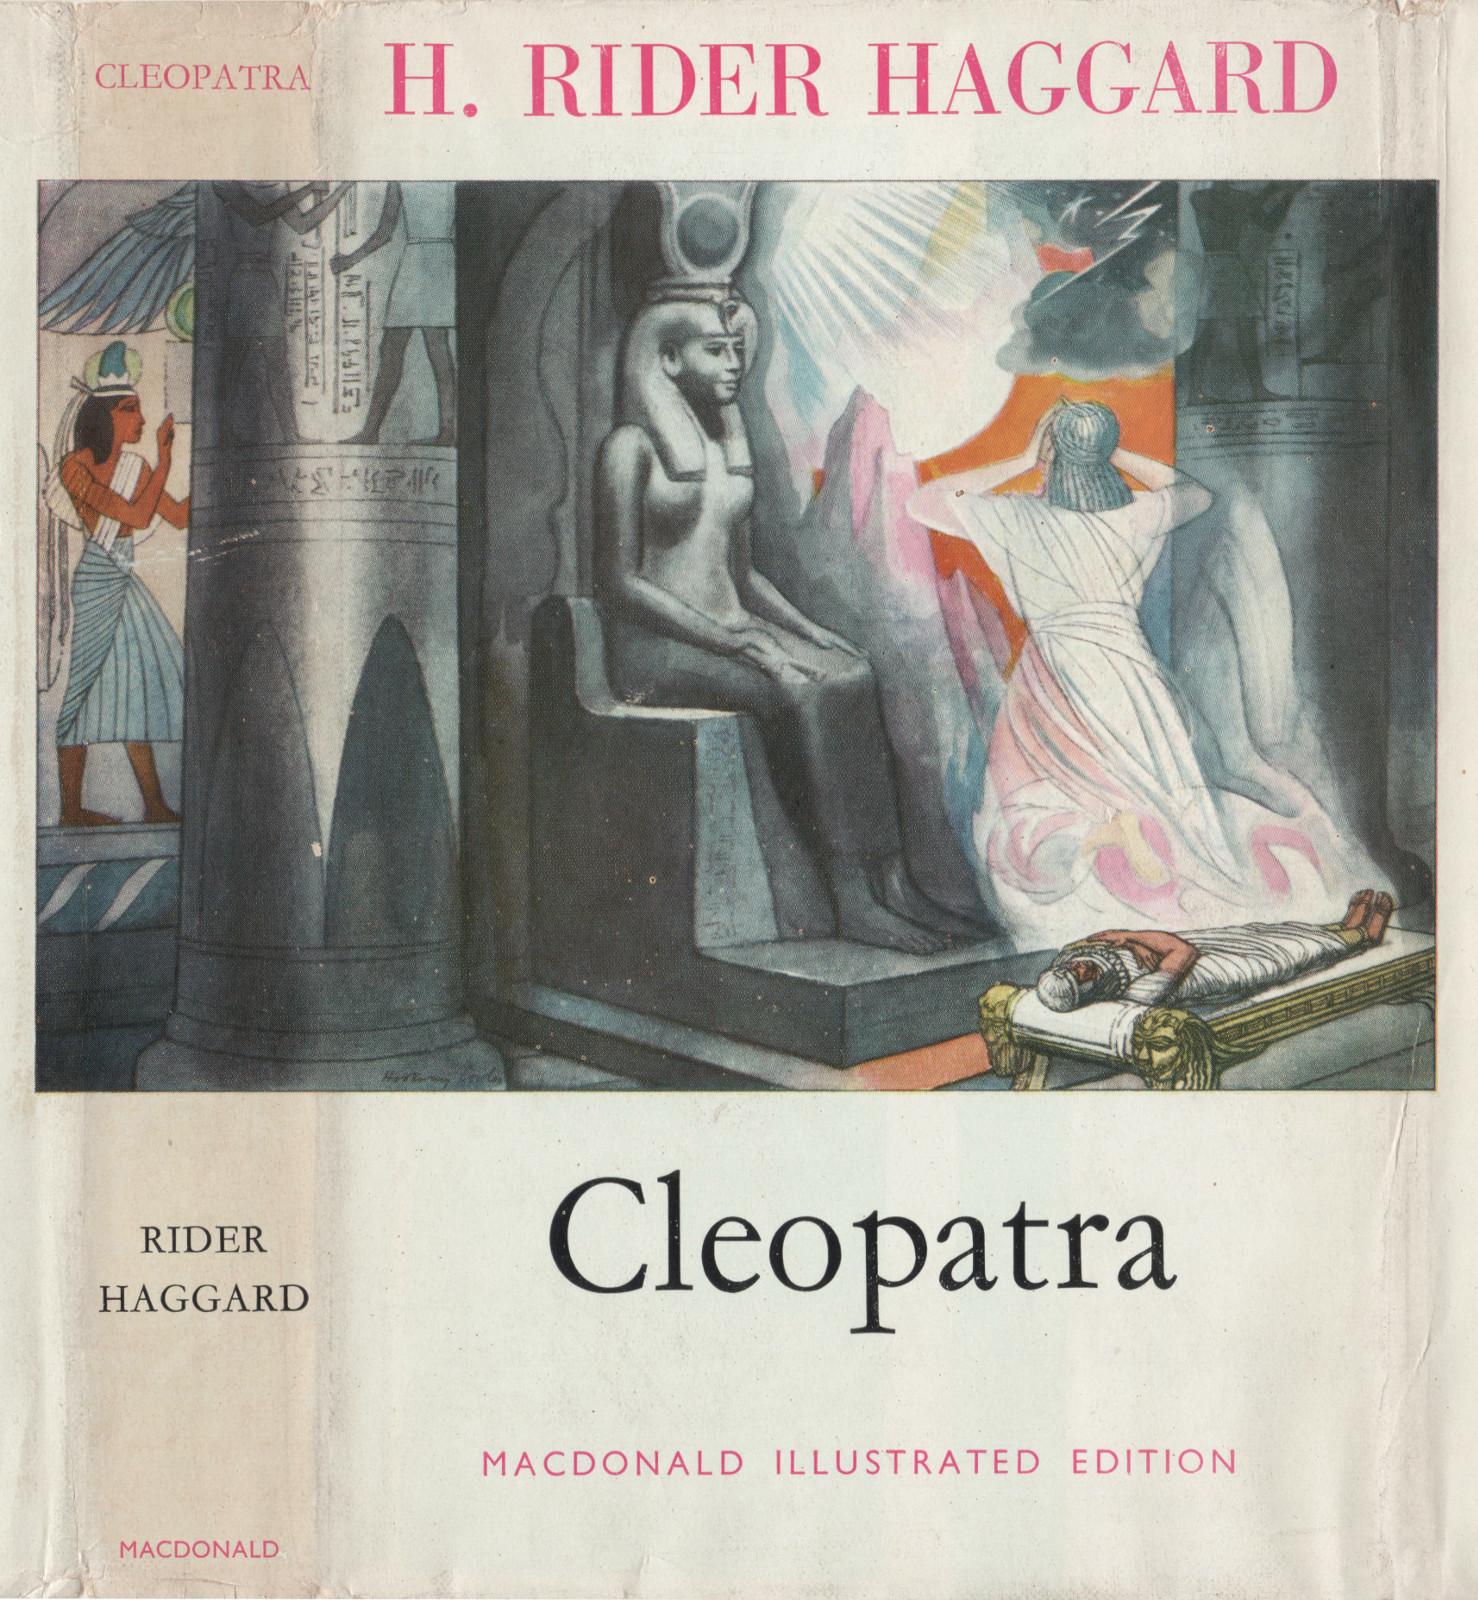 Cleopatramacdonalddustjacket